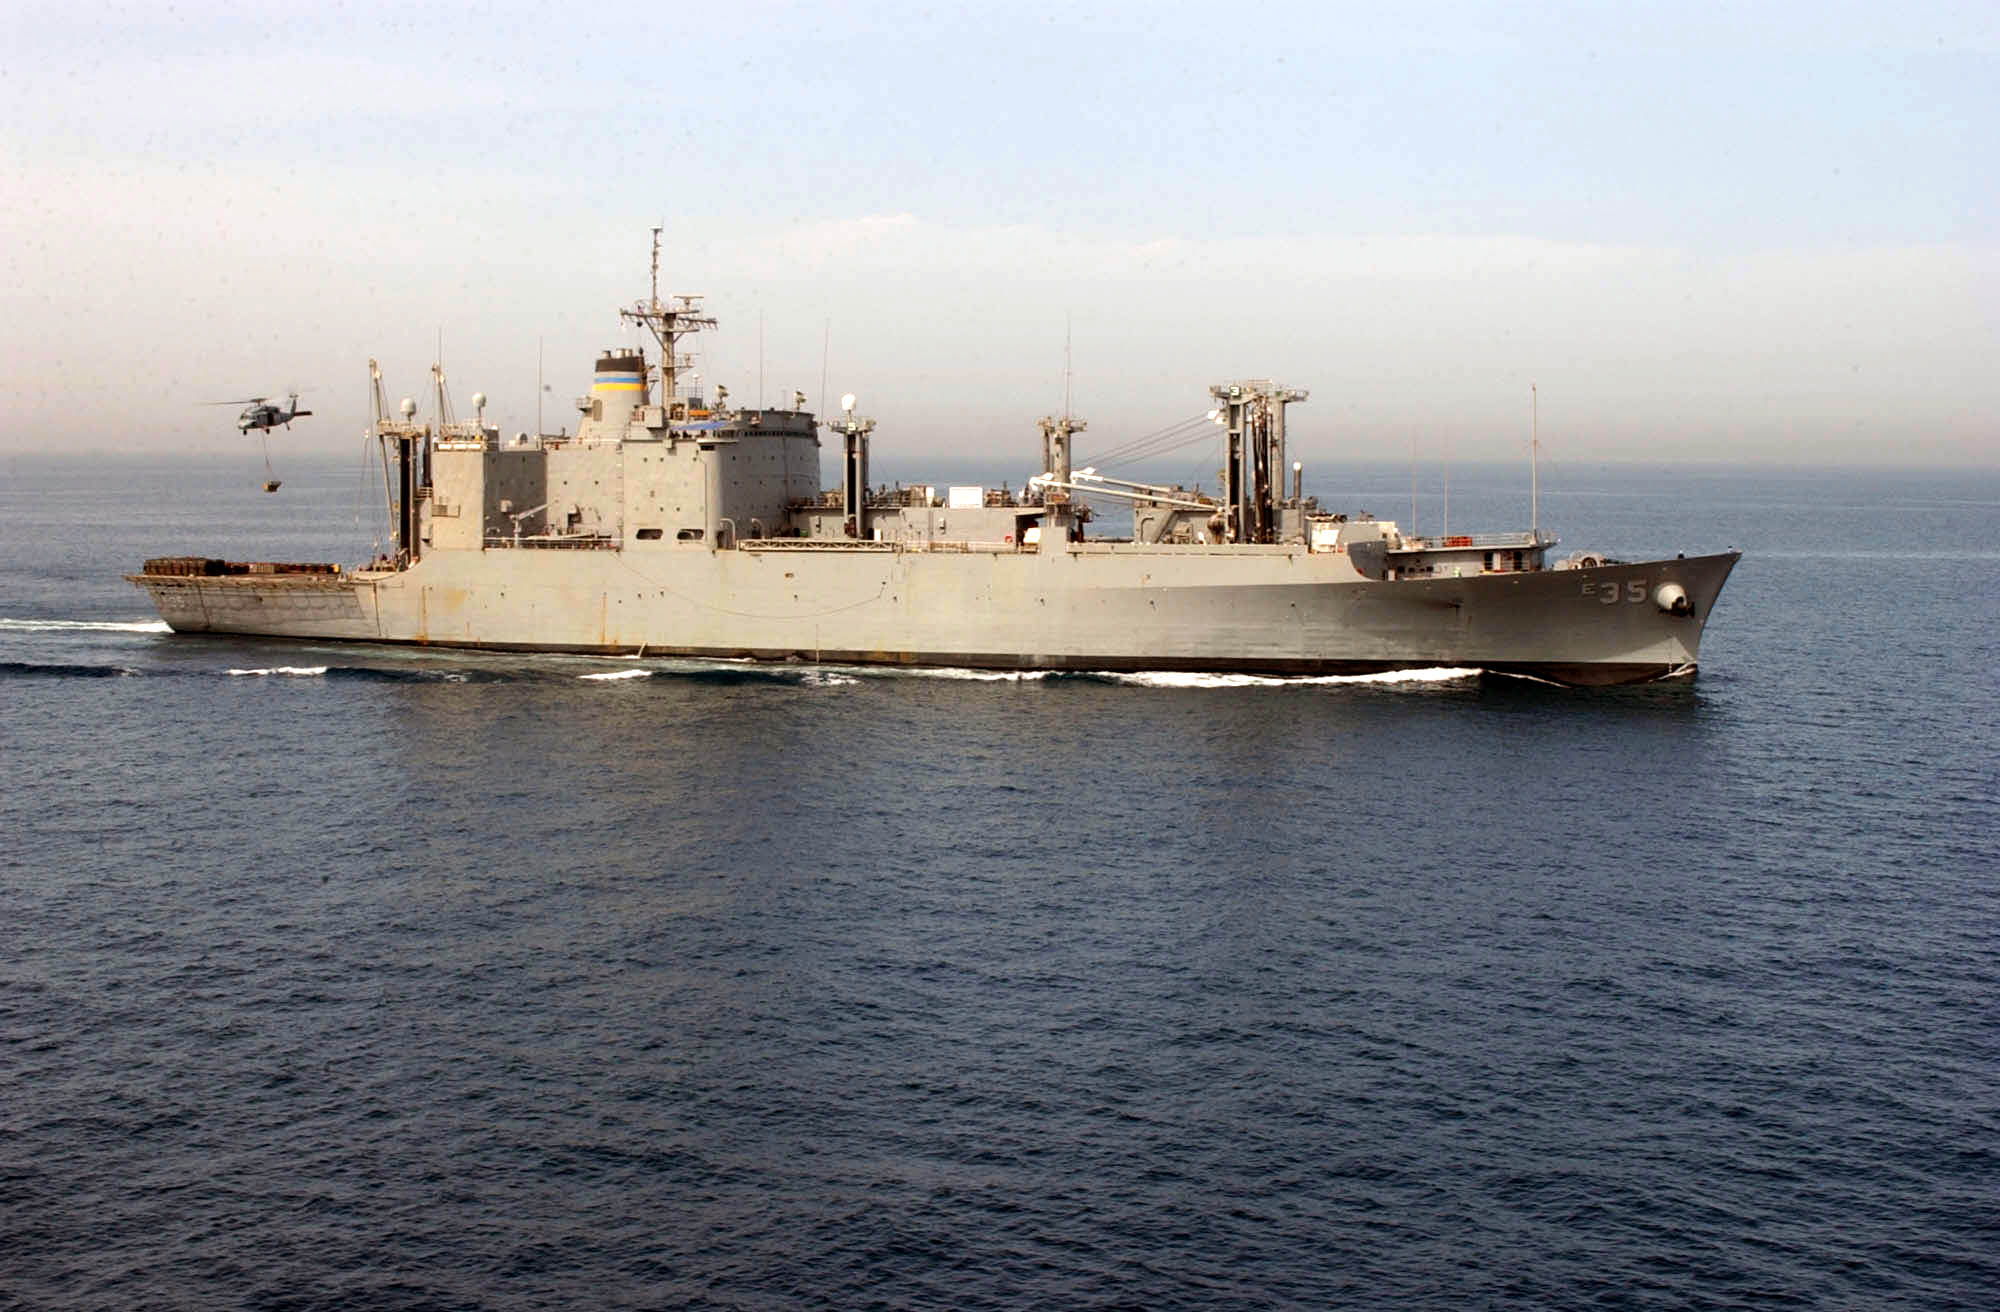 USNS Kiska in the Persian Gulf, 2003